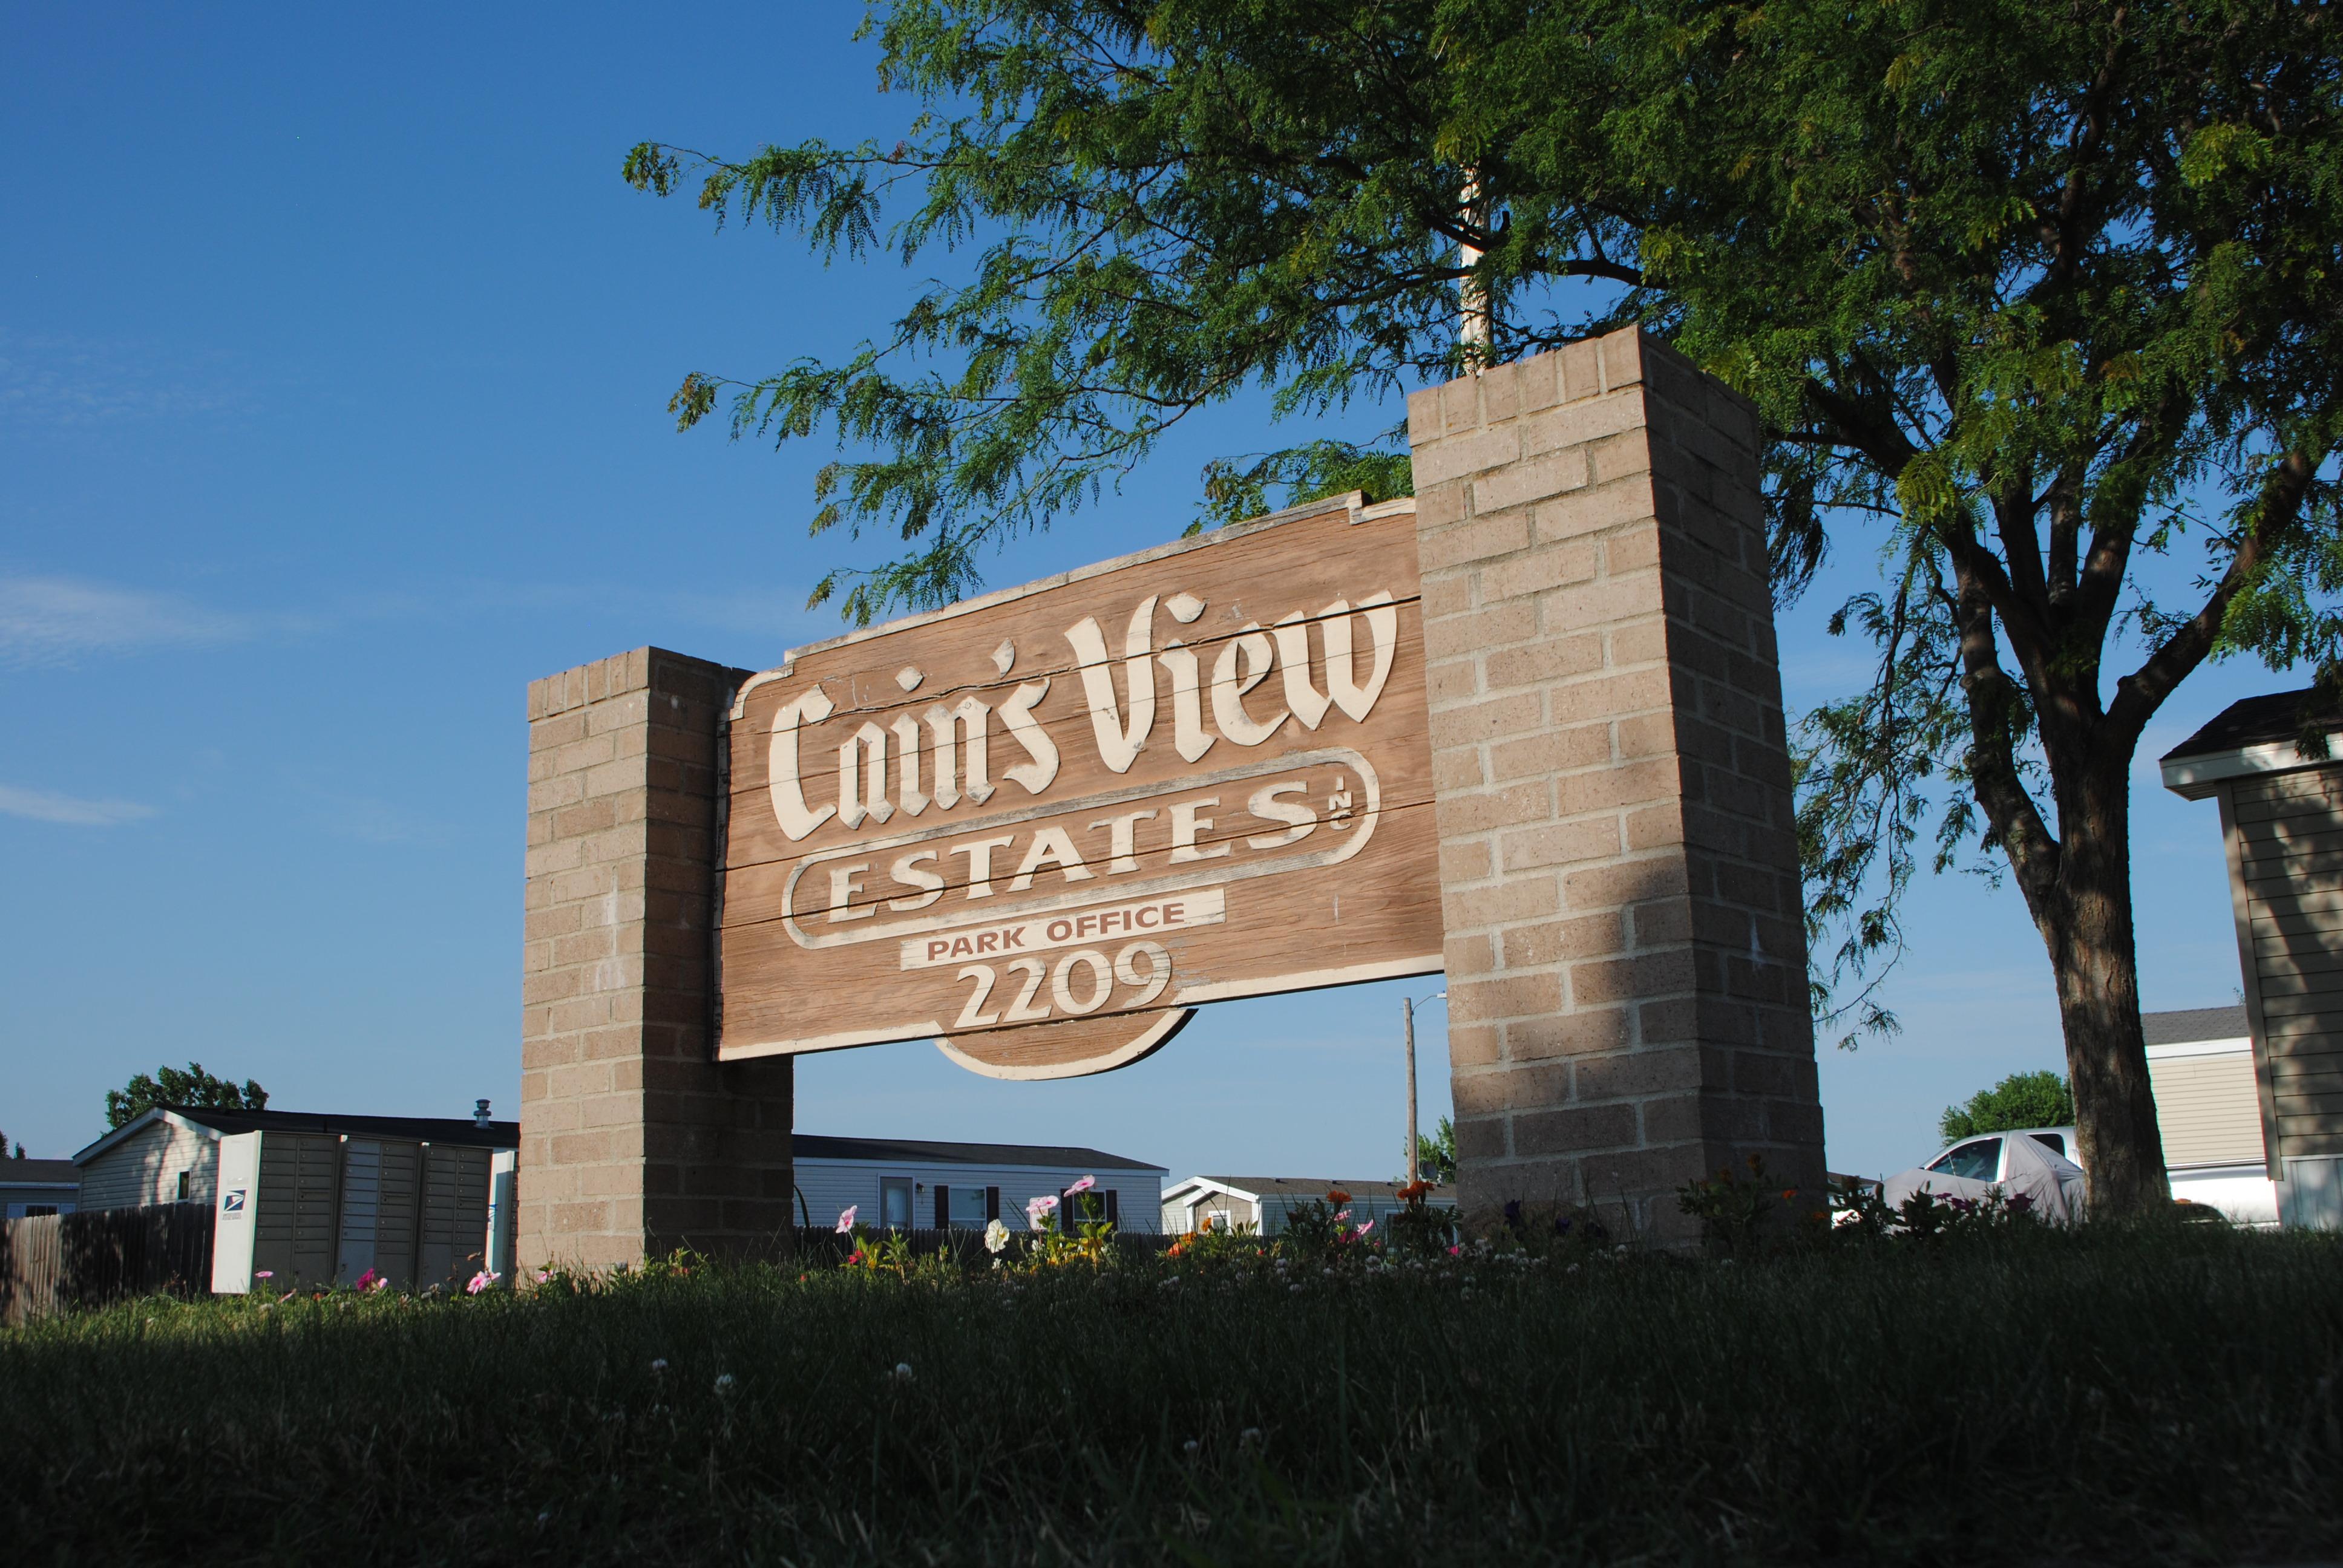 Cain's View Estates